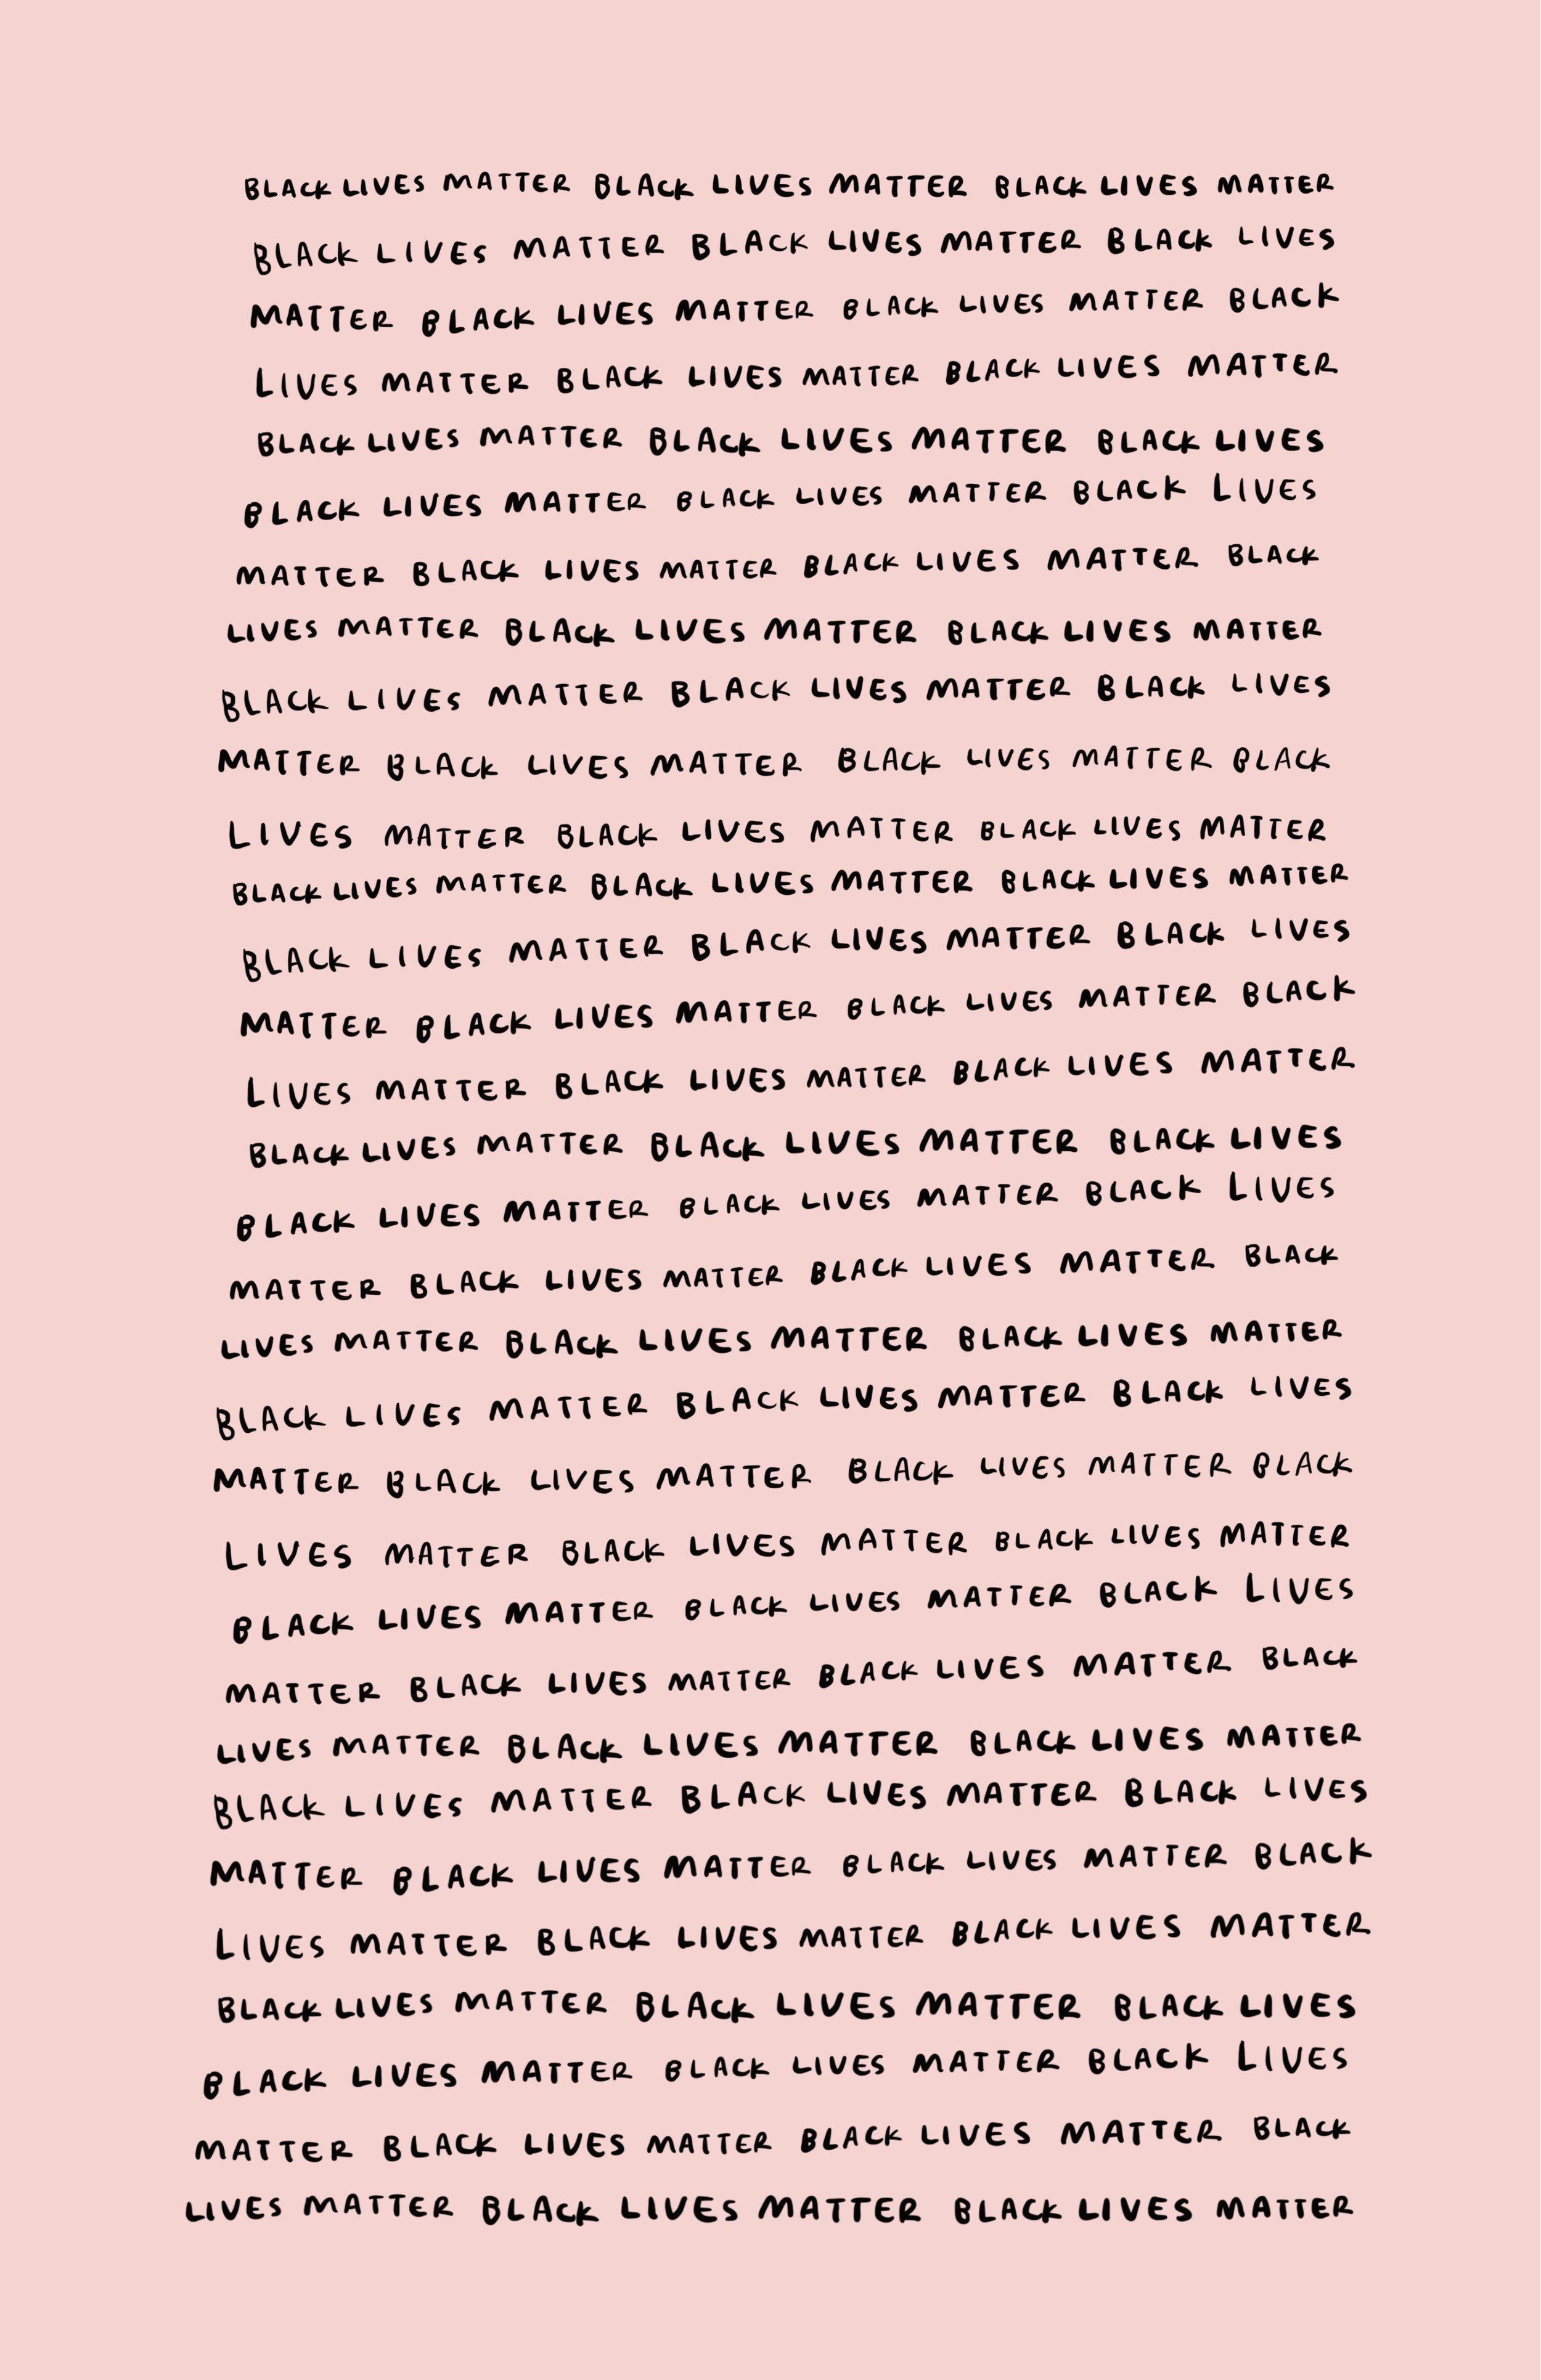 Black Lives Matter Posters4.jpg